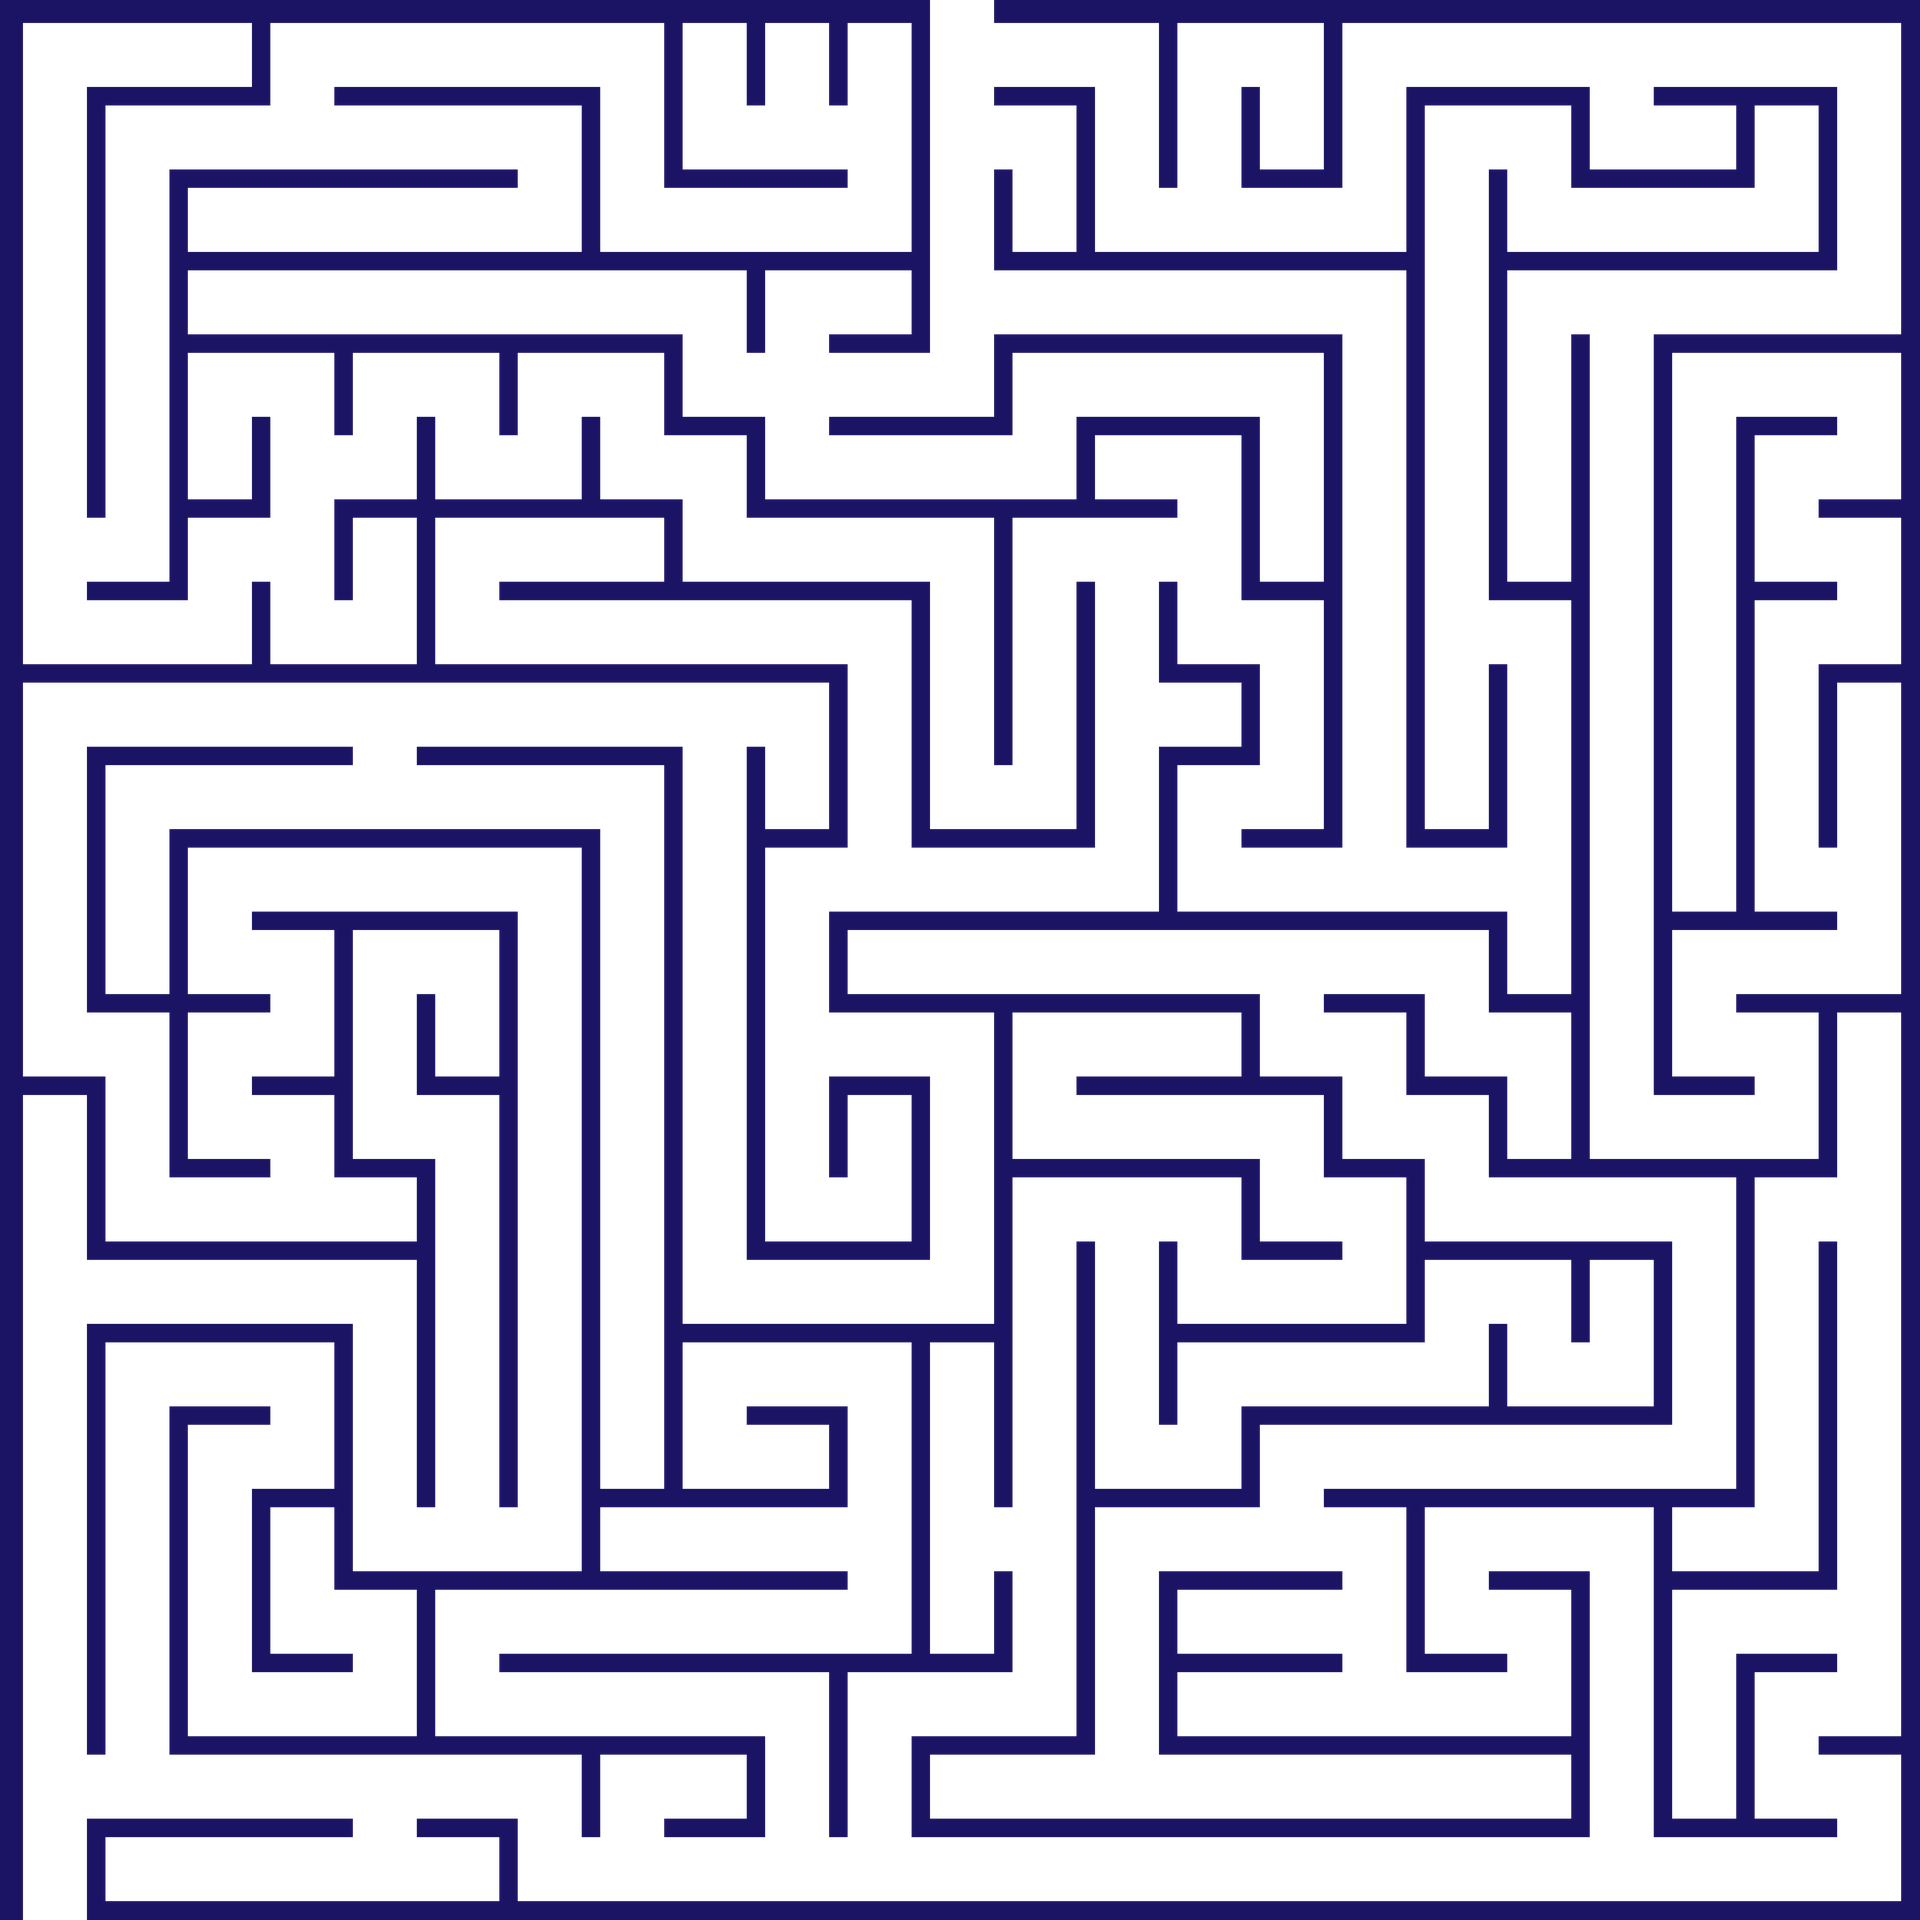 maze-1800993_1920